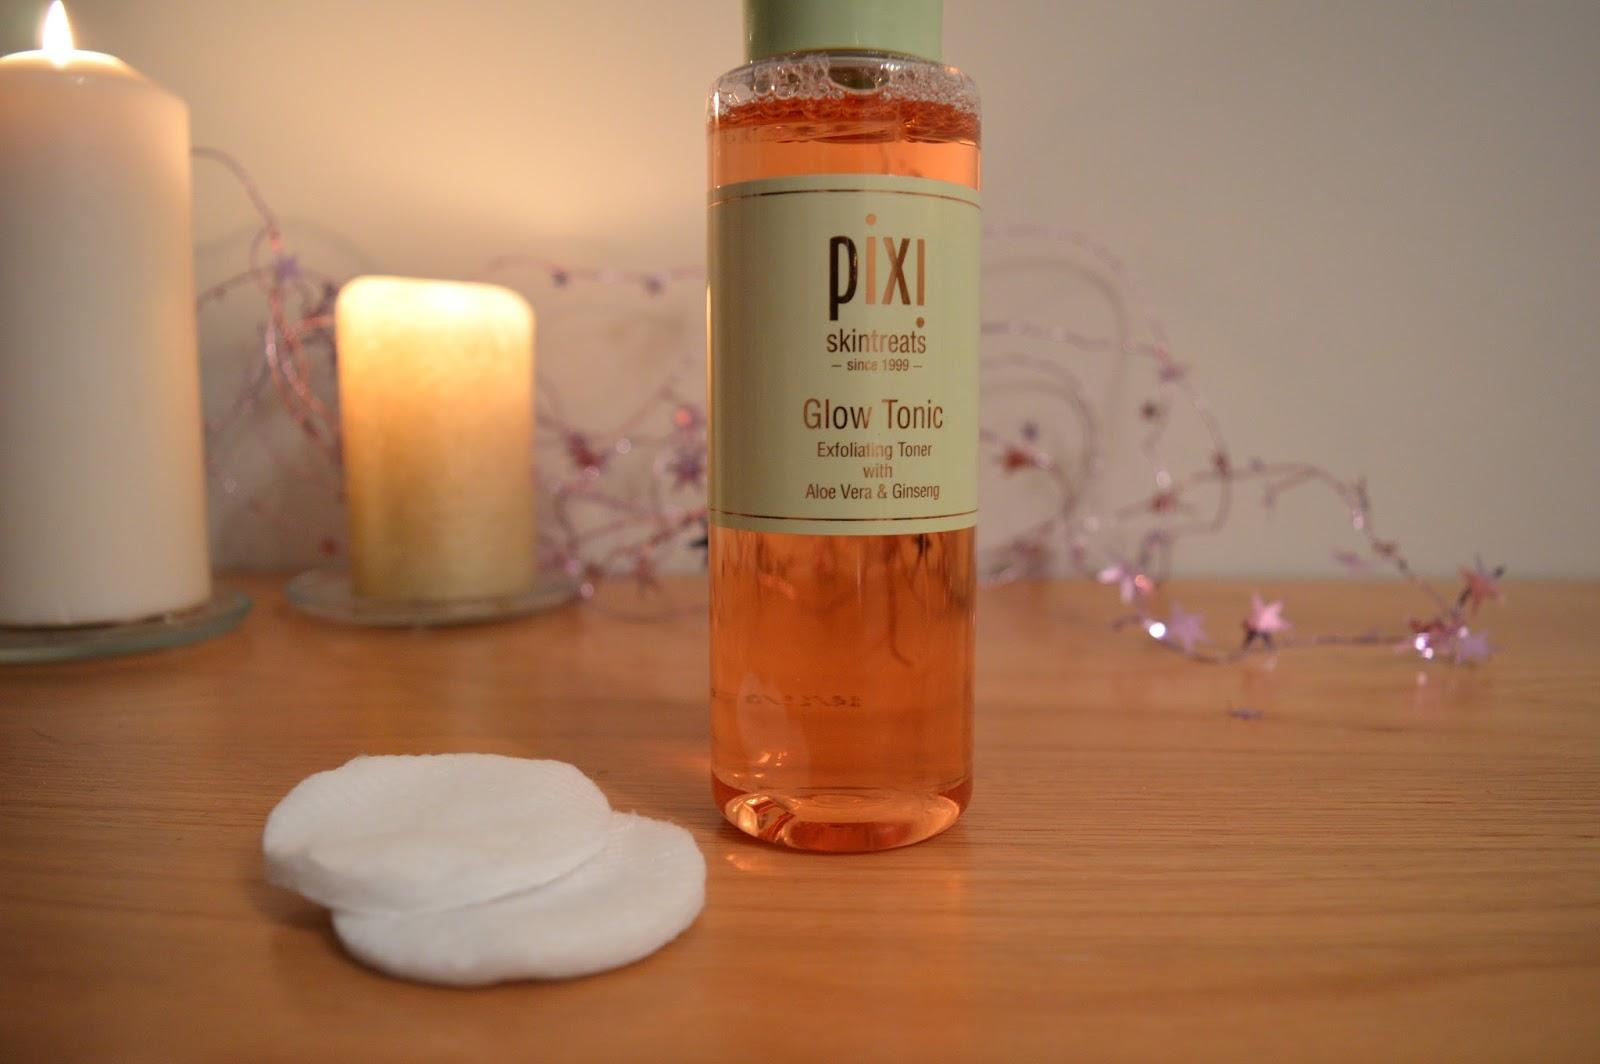 Pixi Glow Tonic Exfoliating Toner Review